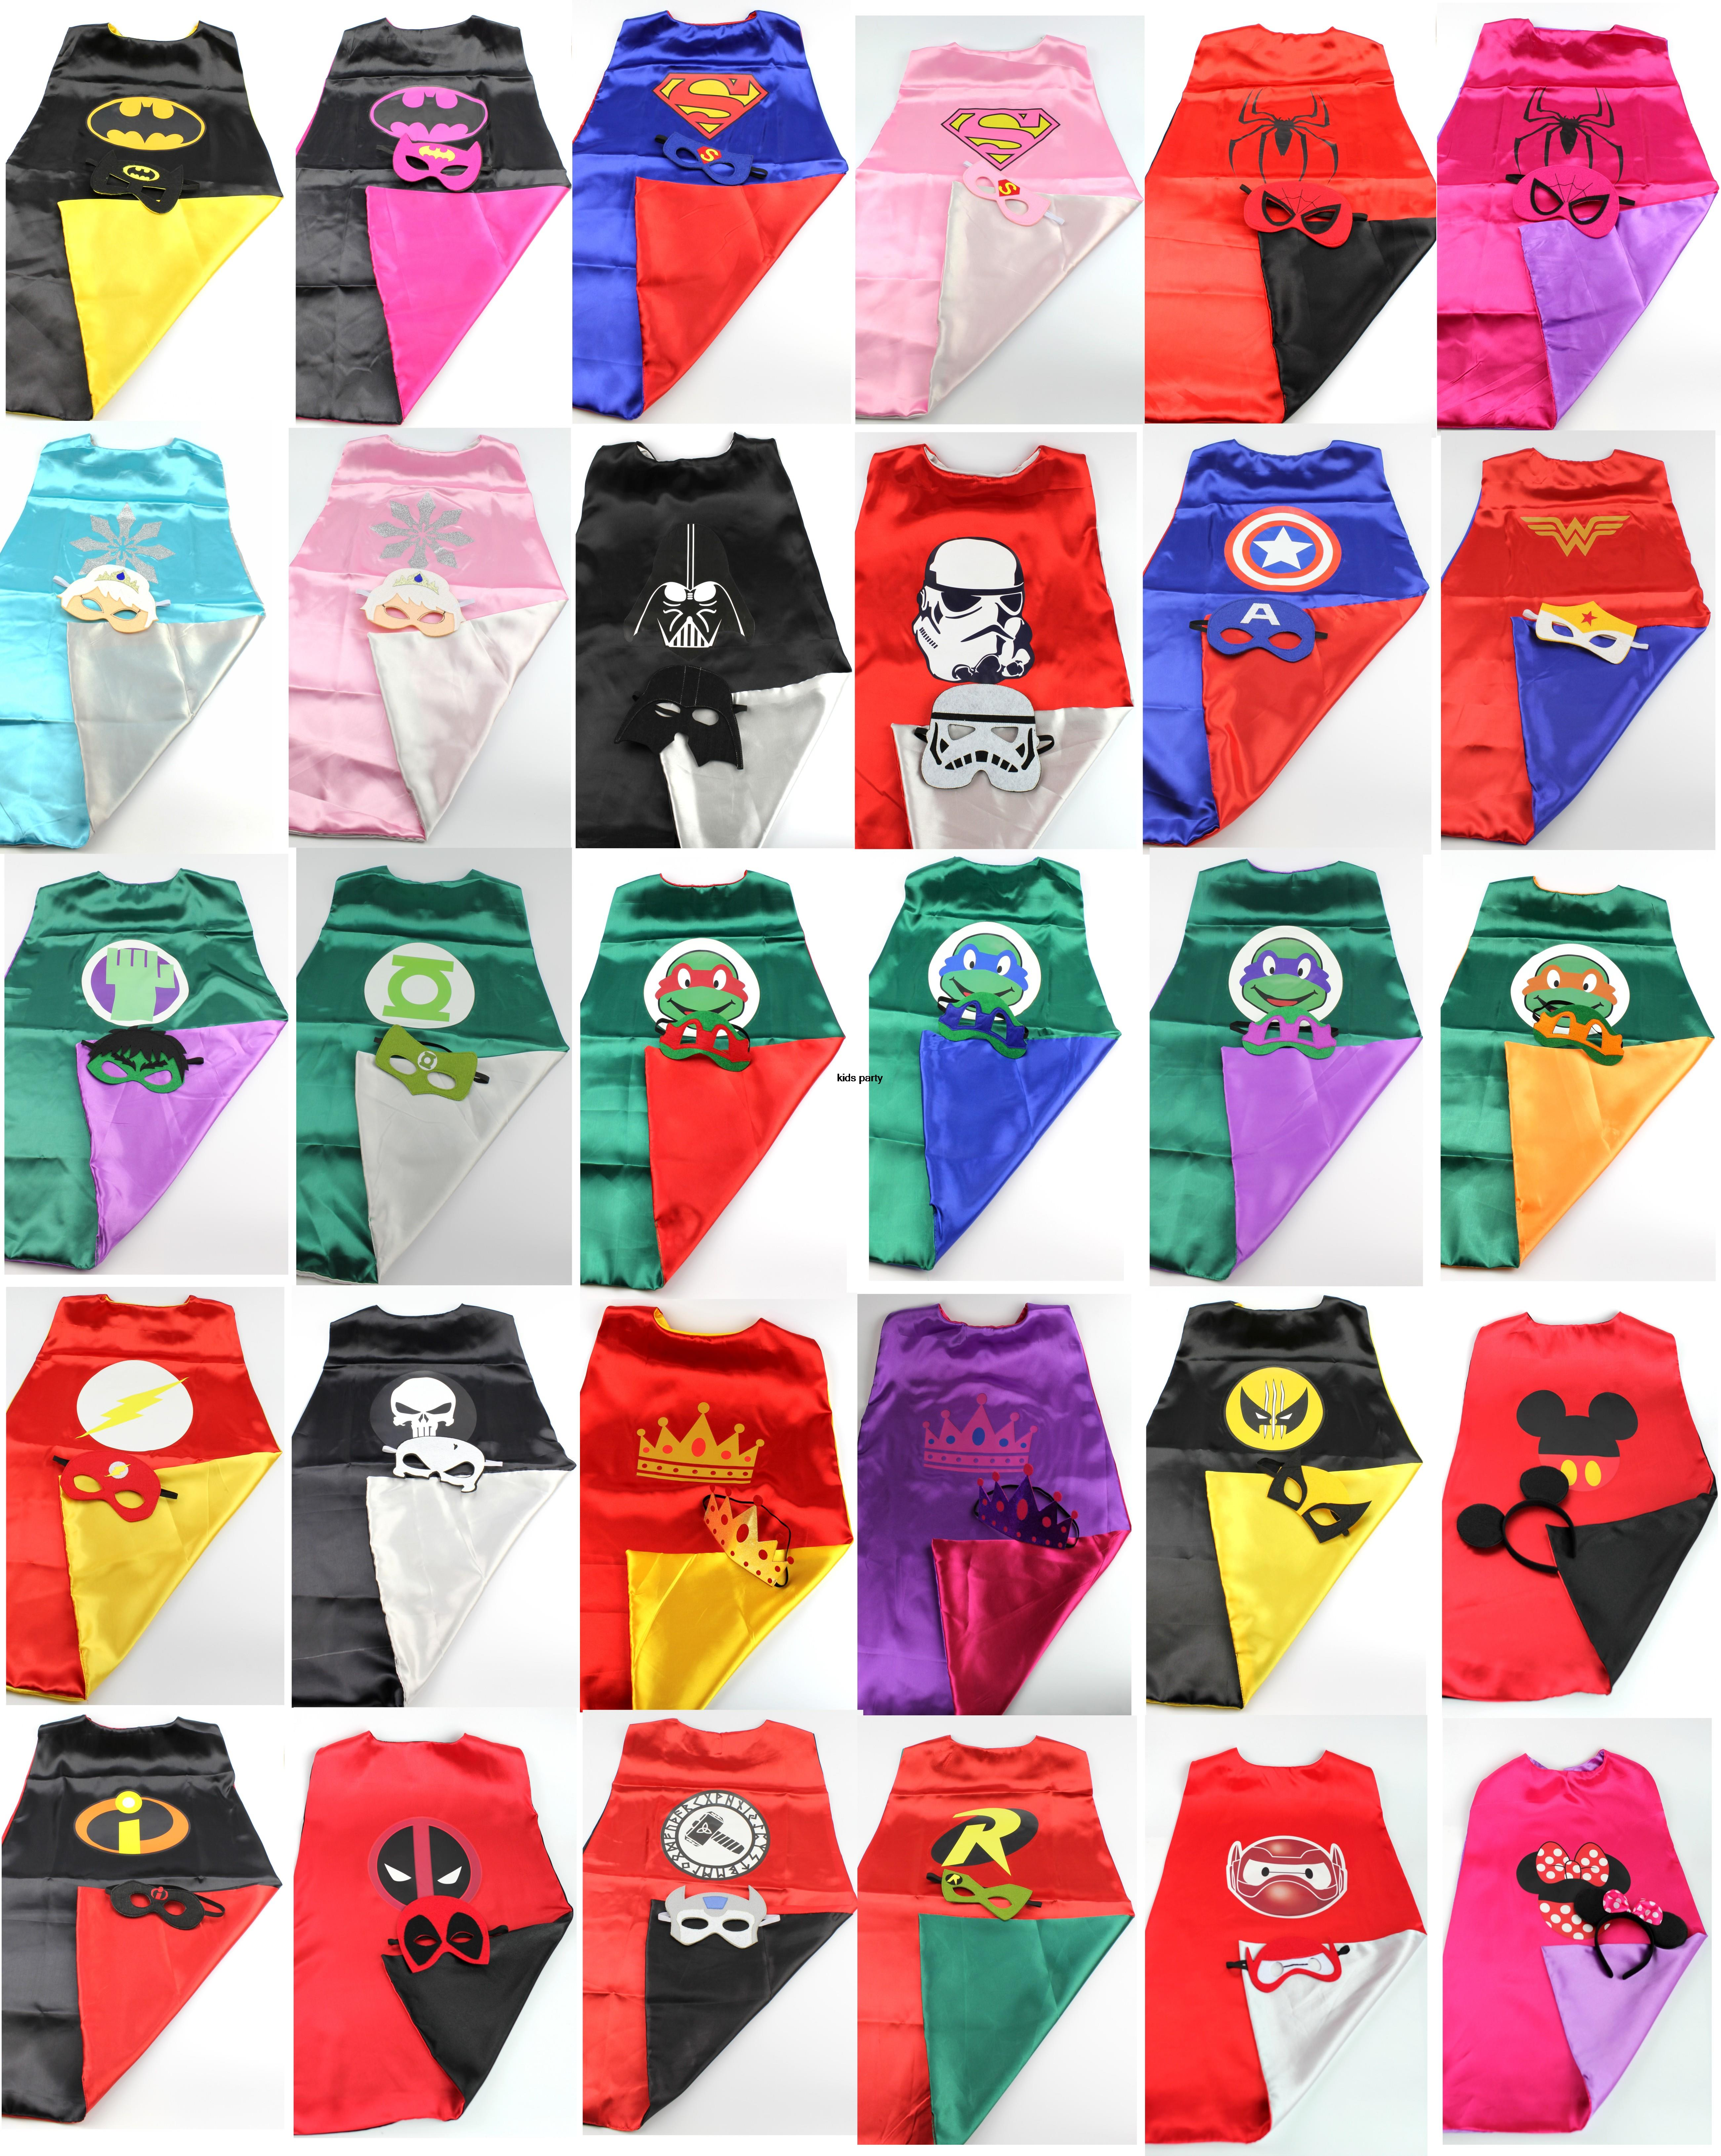 kaufen superheld kap 1cape 1mask batman superheld. Black Bedroom Furniture Sets. Home Design Ideas